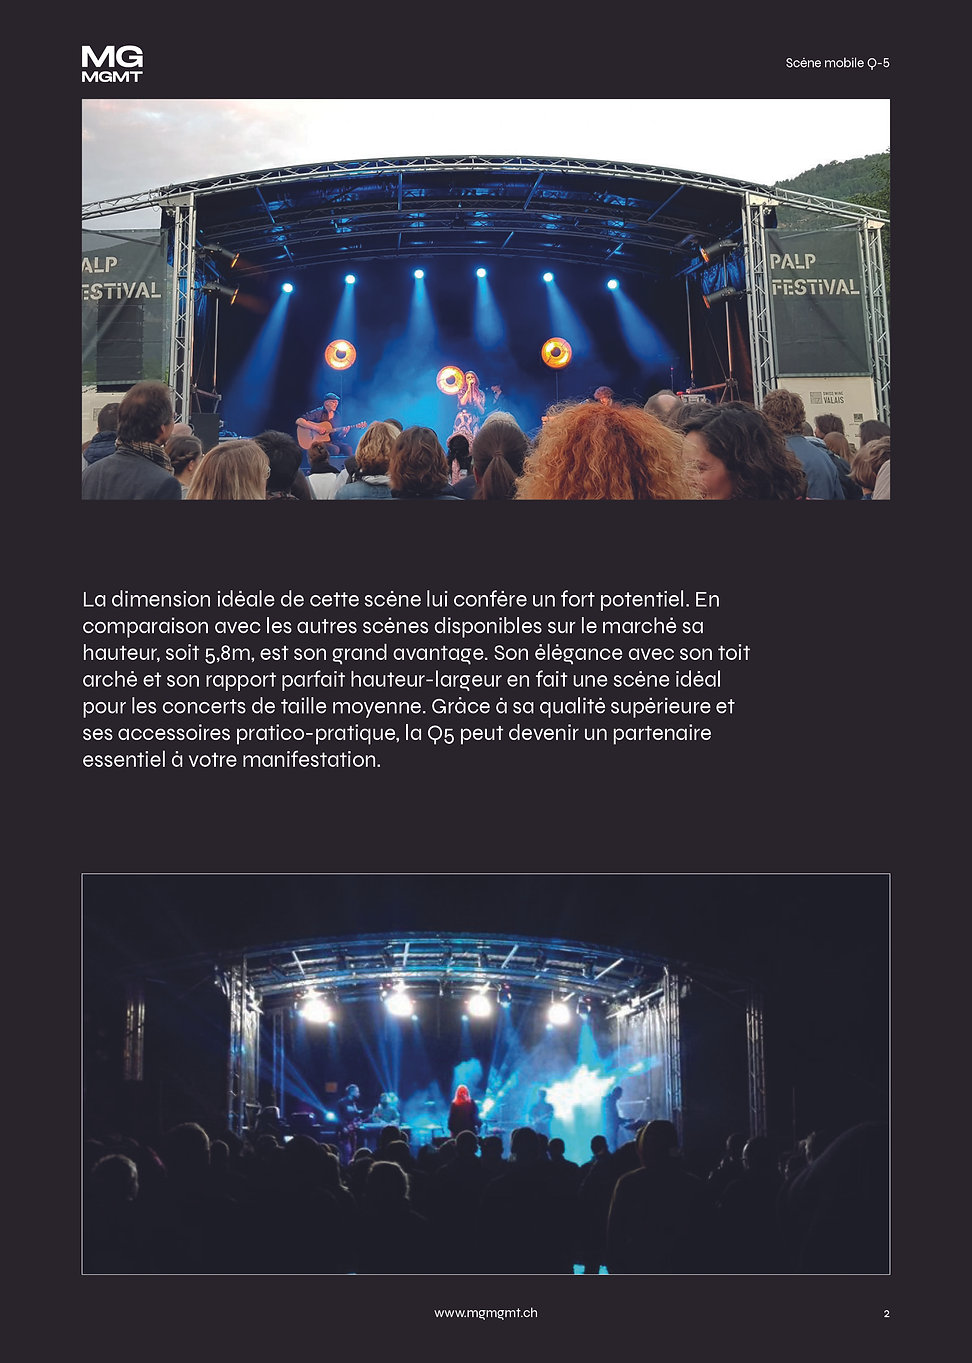 brochure_mgmt_20200223-2.jpg